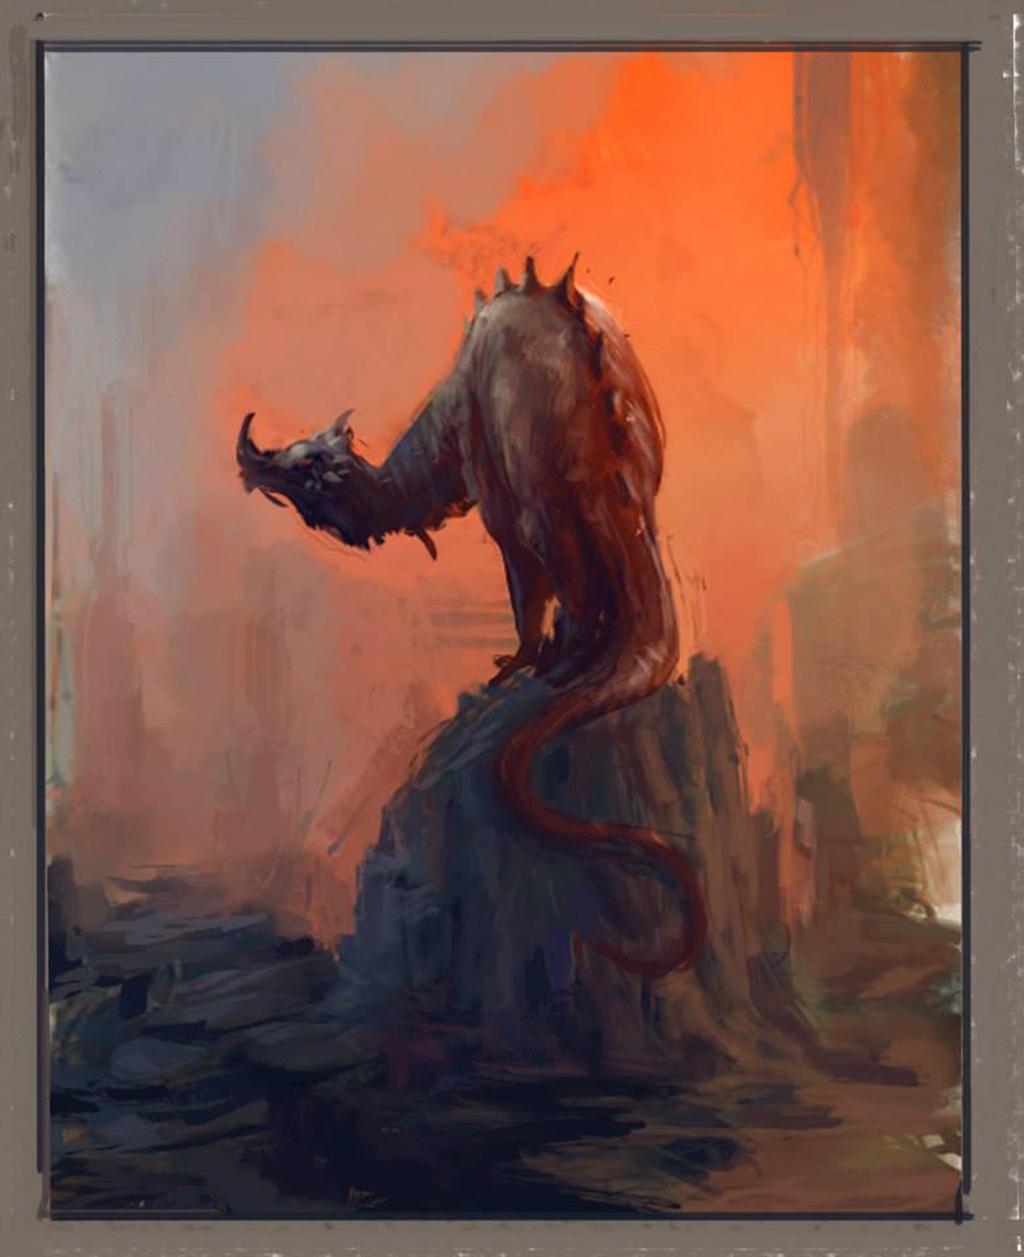 Dragon by Darkcloud013